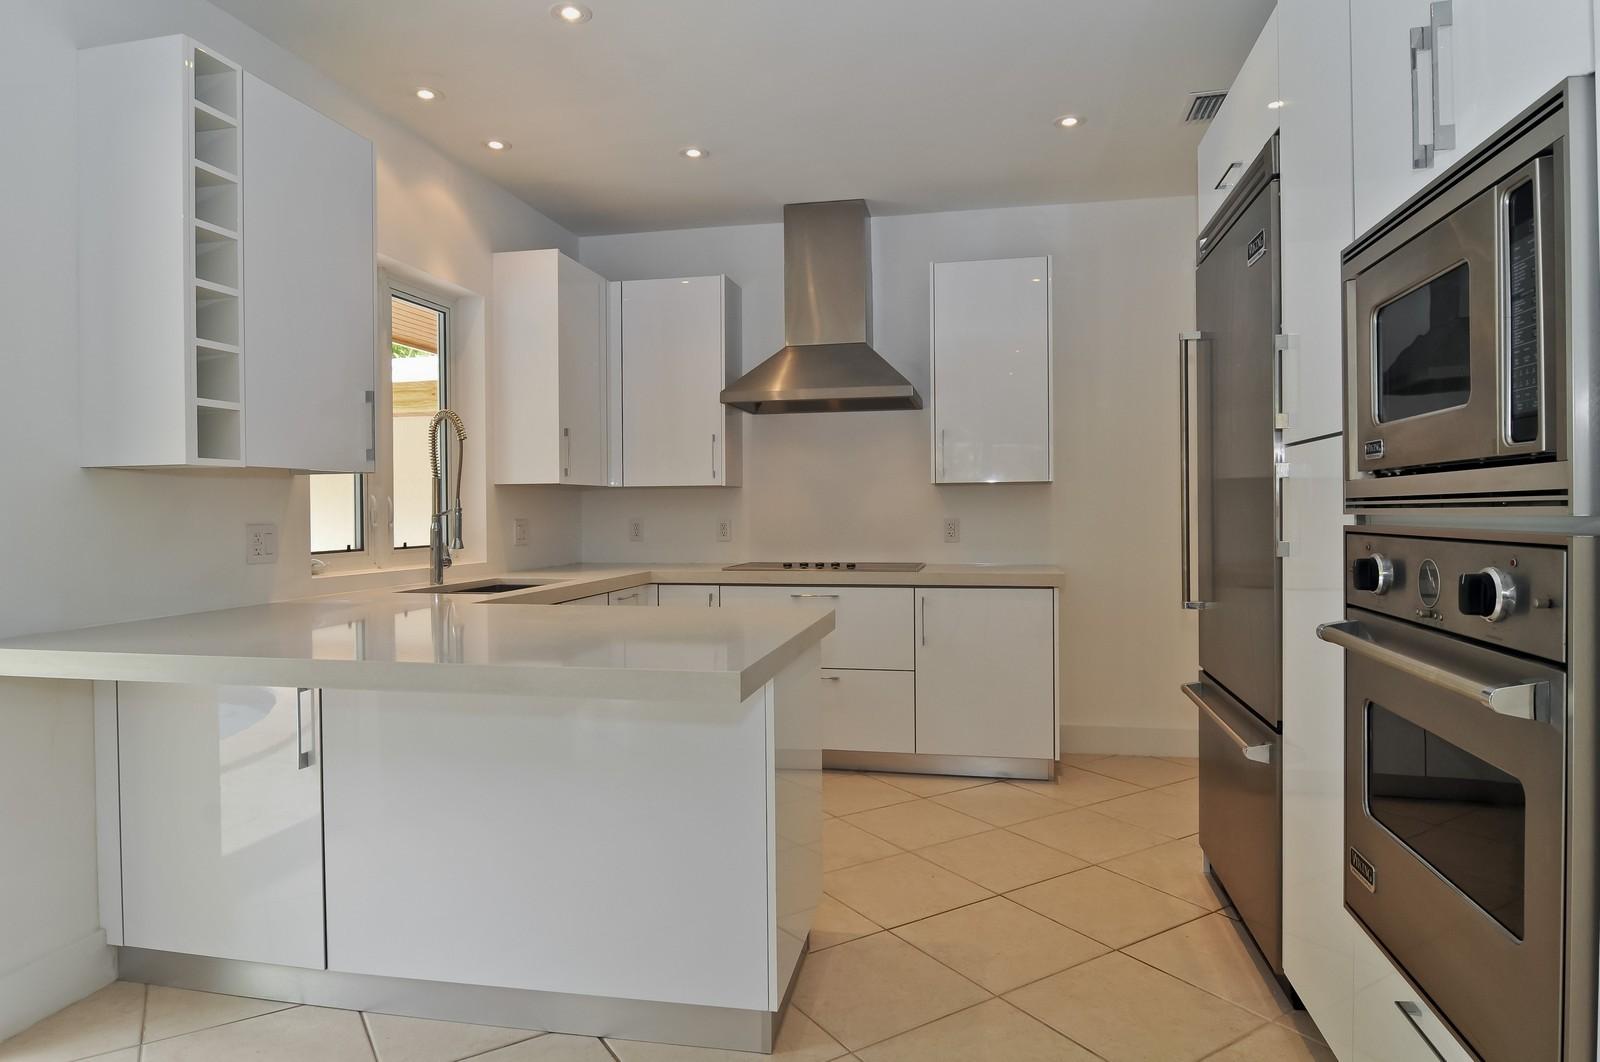 Real Estate Photography - 3645 Battersea, Miami, FL, 33133 - Kitchen